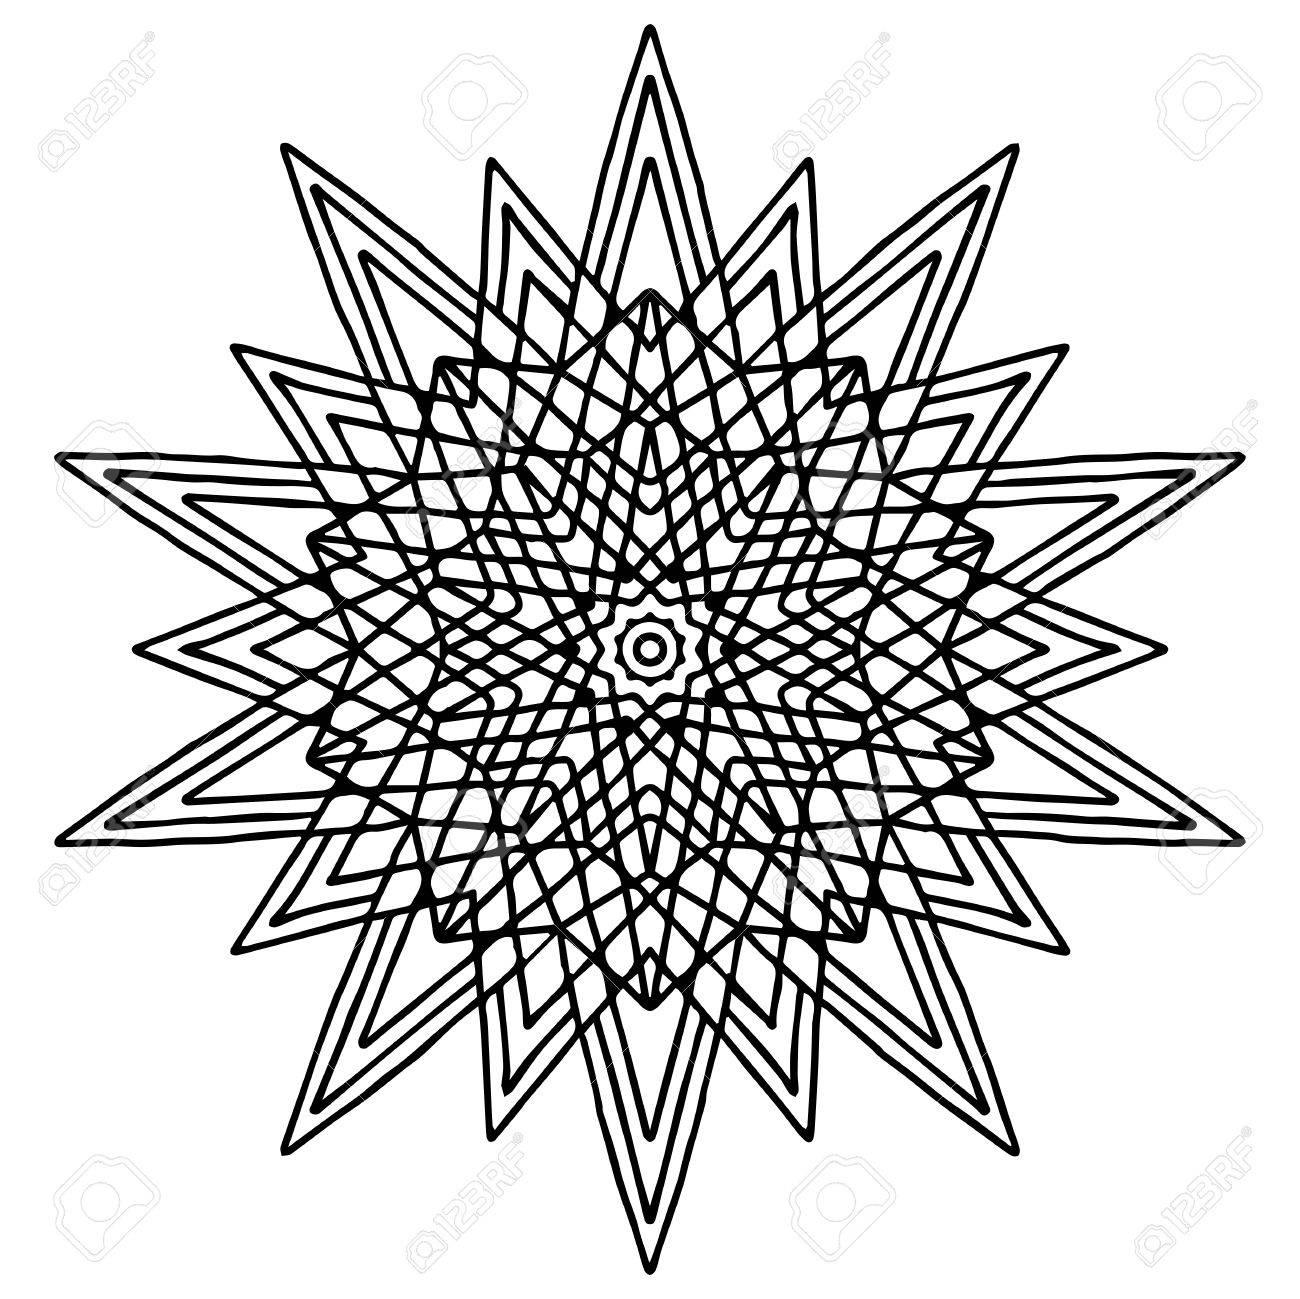 Coloriage Etoile Mandala.Dessin A La Main De Noel Doodling Etoile Mandala Coloriage Page